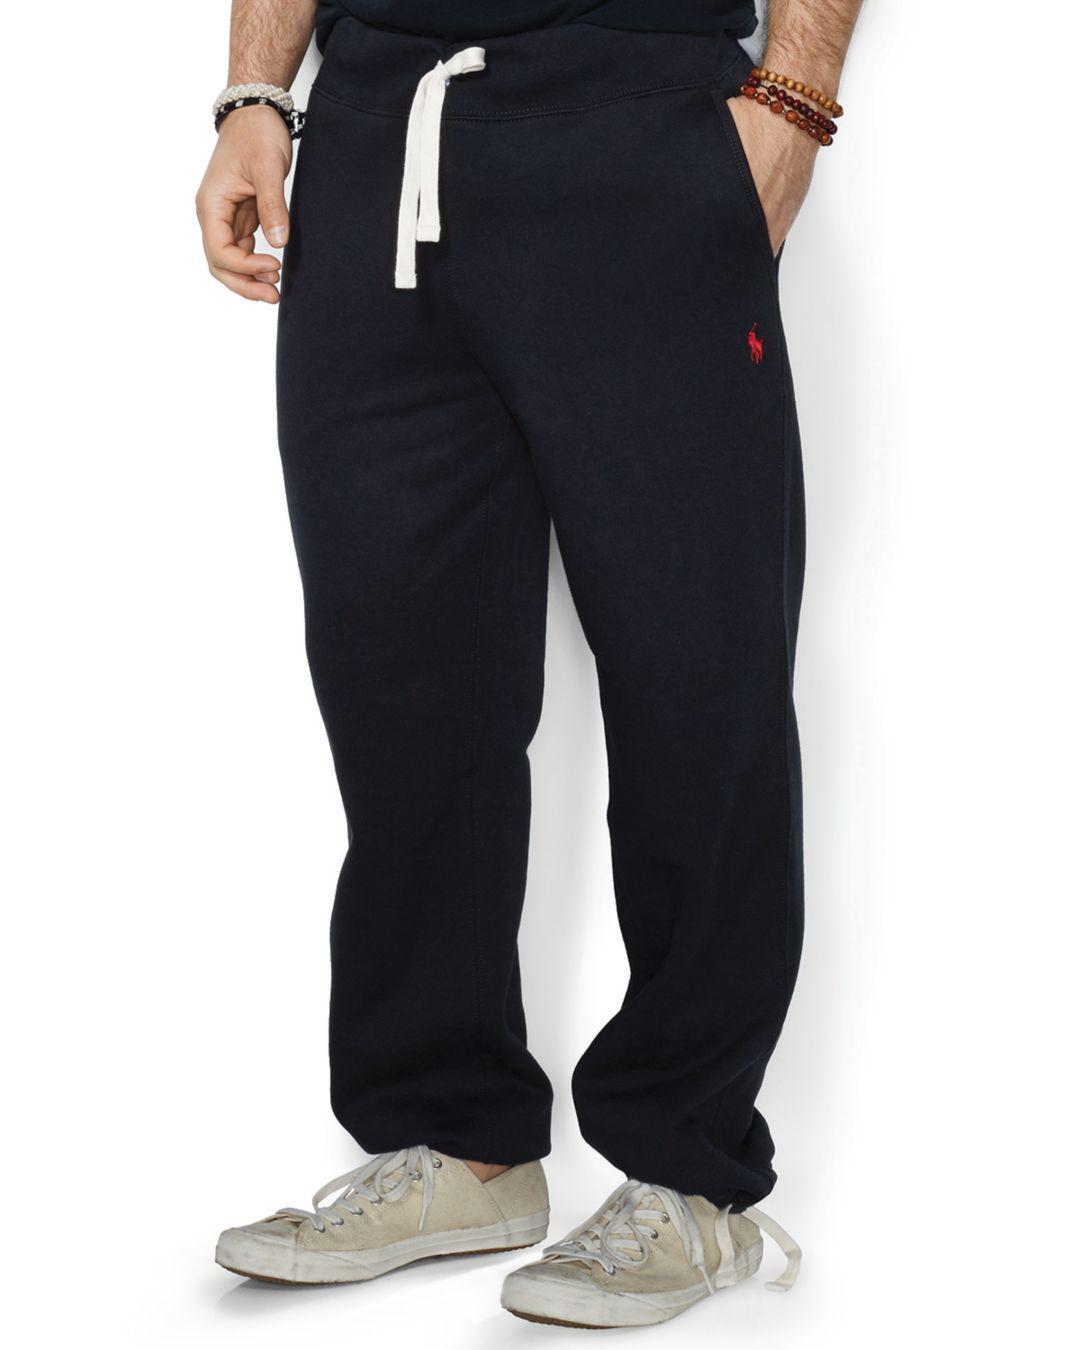 bce39e72e Polo Ralph Lauren Fleece Drawstring Sweatpants in Black for Men ...